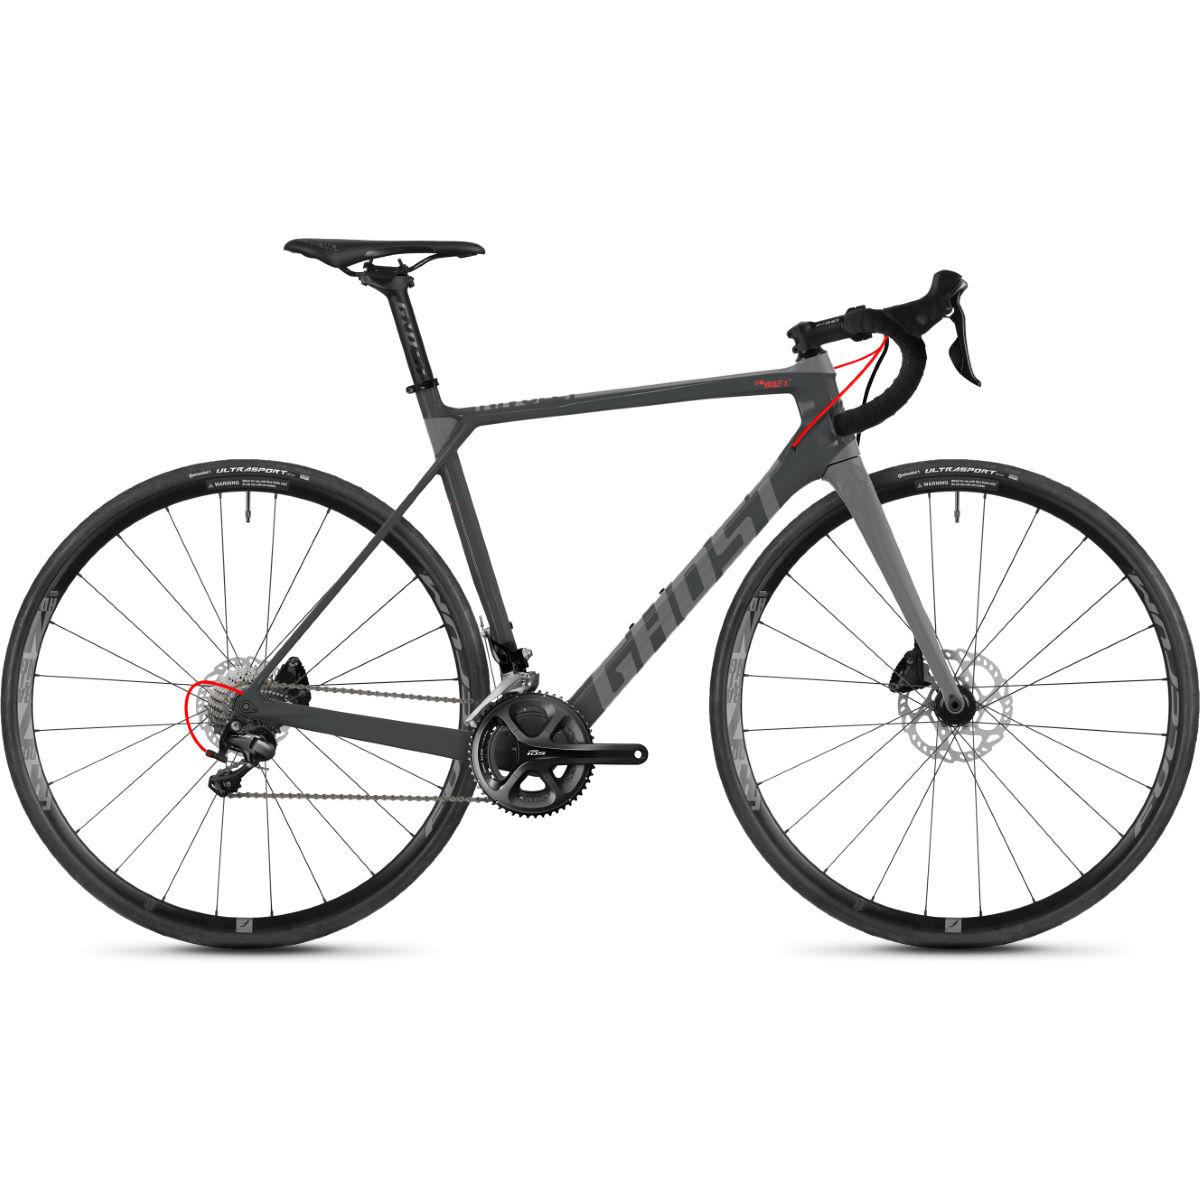 Ghost Nivolet X5.8 Disc 2018 Bikes